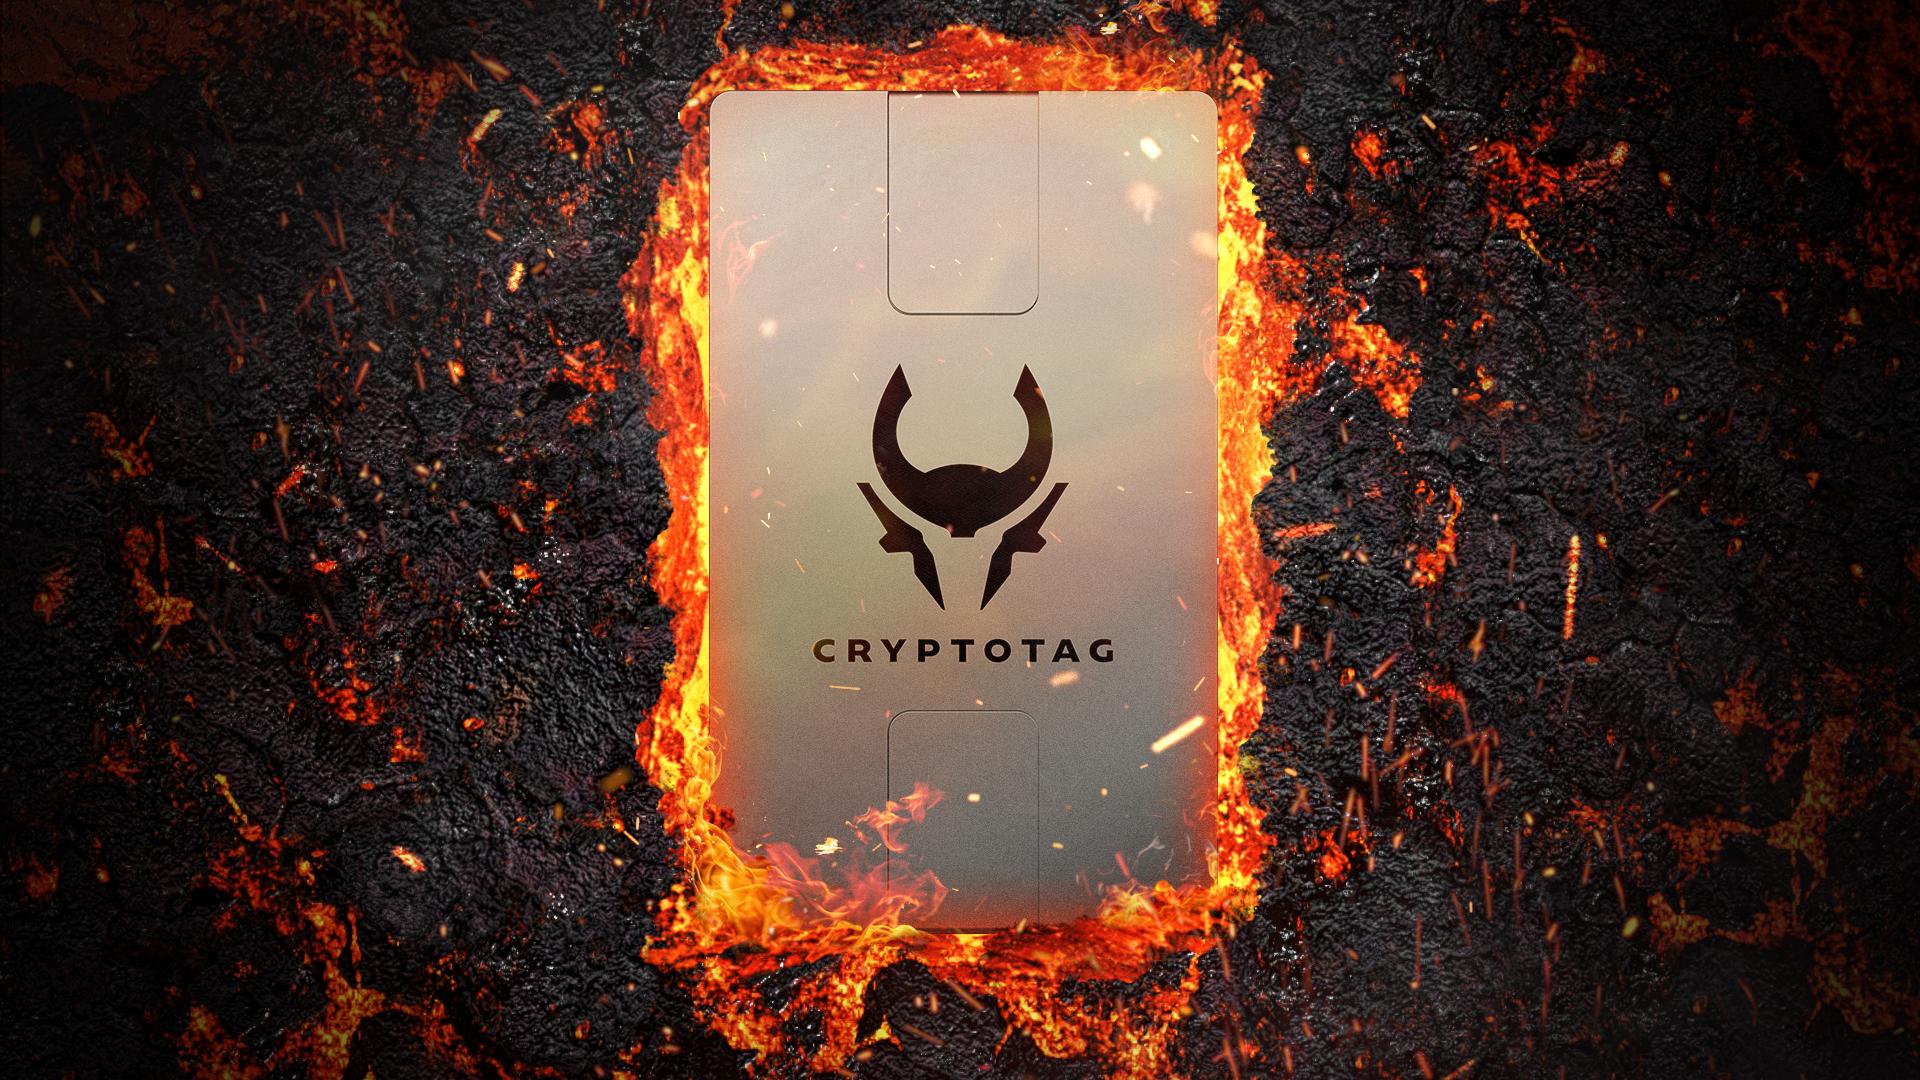 CRYPTOTAG Fire